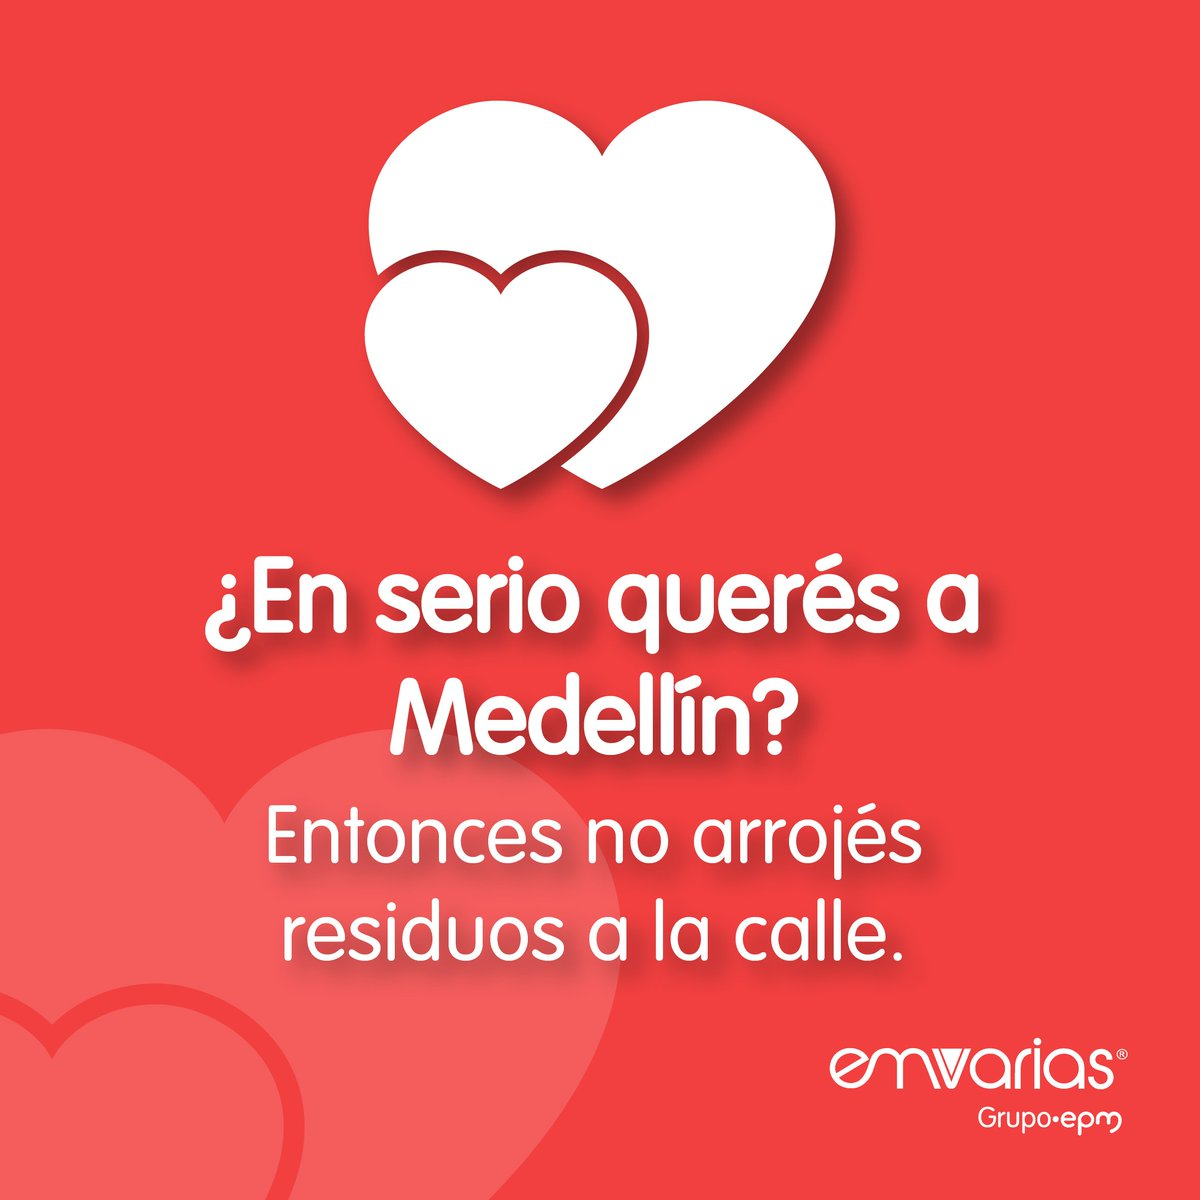 Emvarias Grupo Epm On Twitter Feliz Sábado De Amor Y Amistad